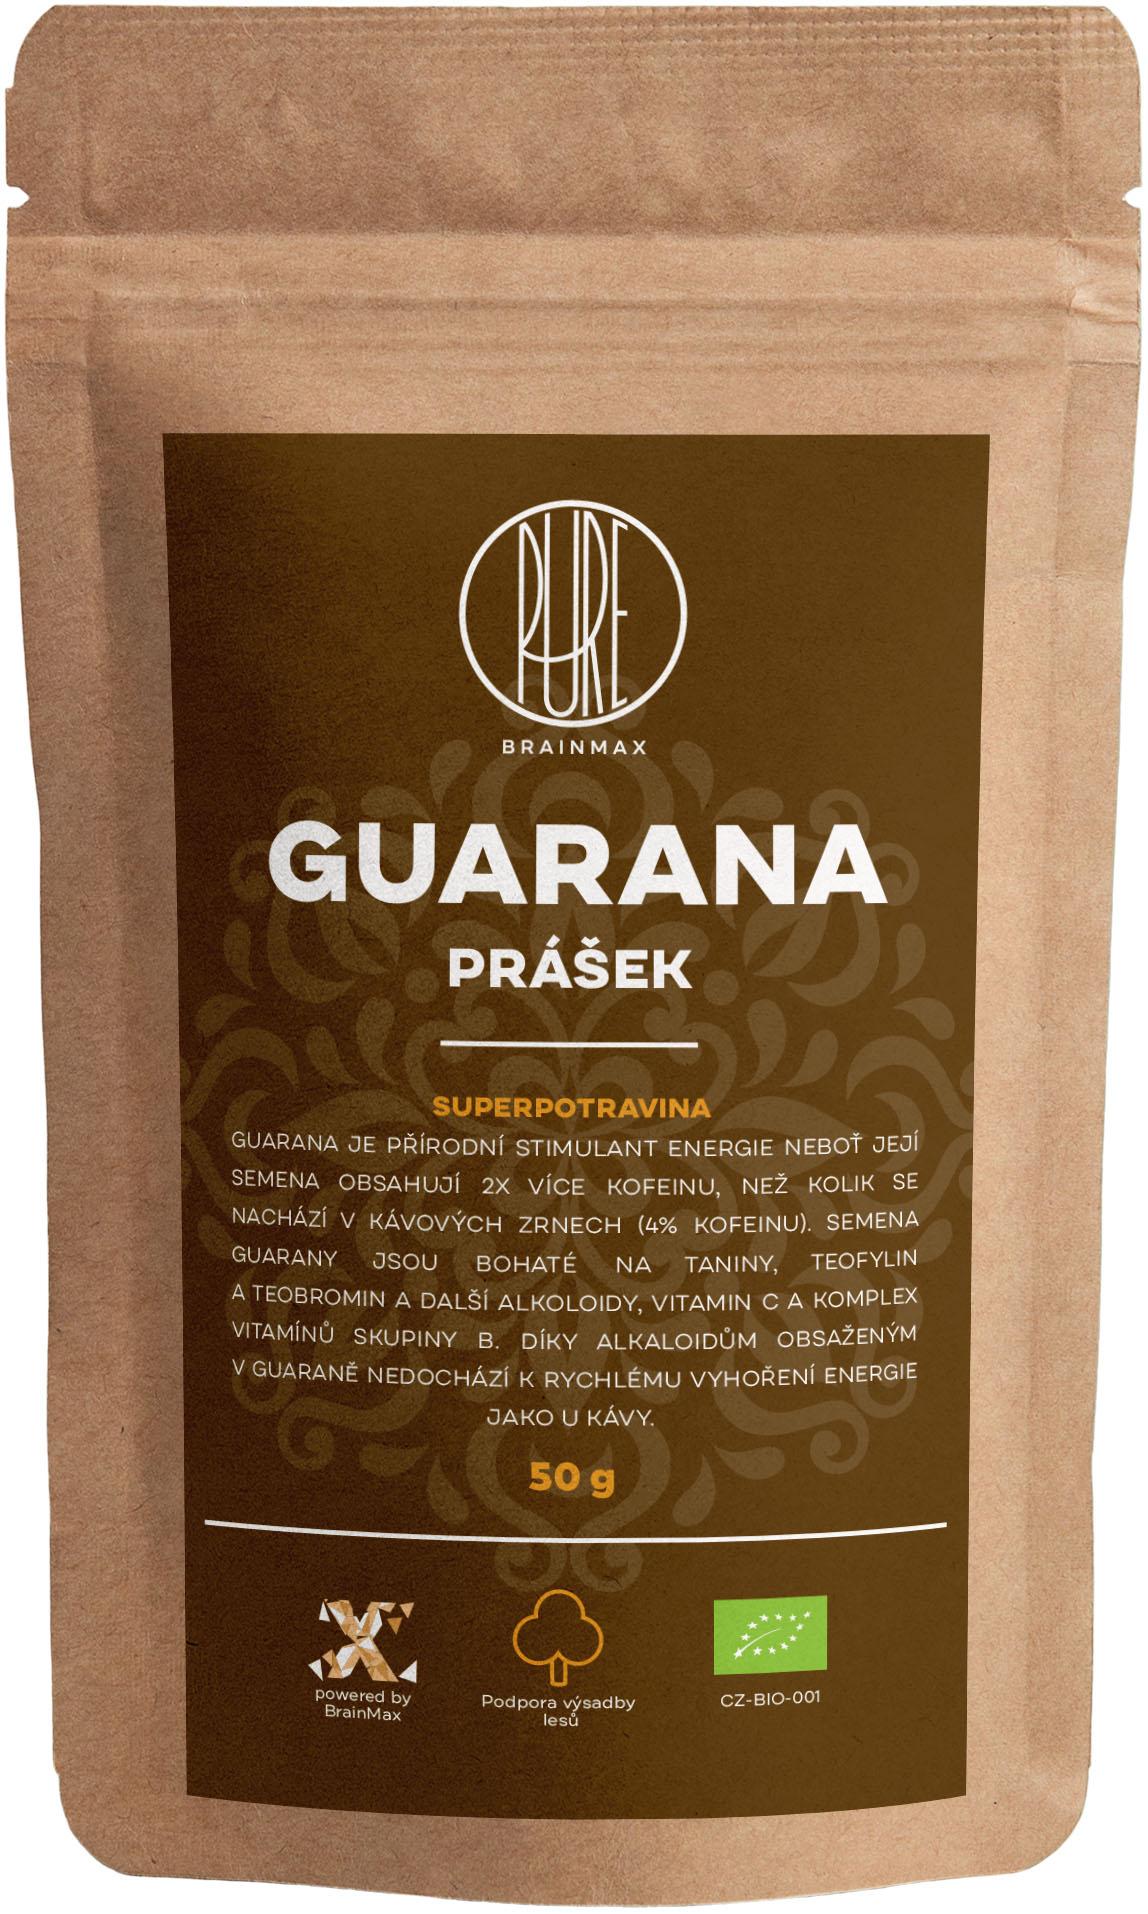 BrainMax Pure Guarana BIO prášok, 50 g *CZ-BIO-001 certifikát